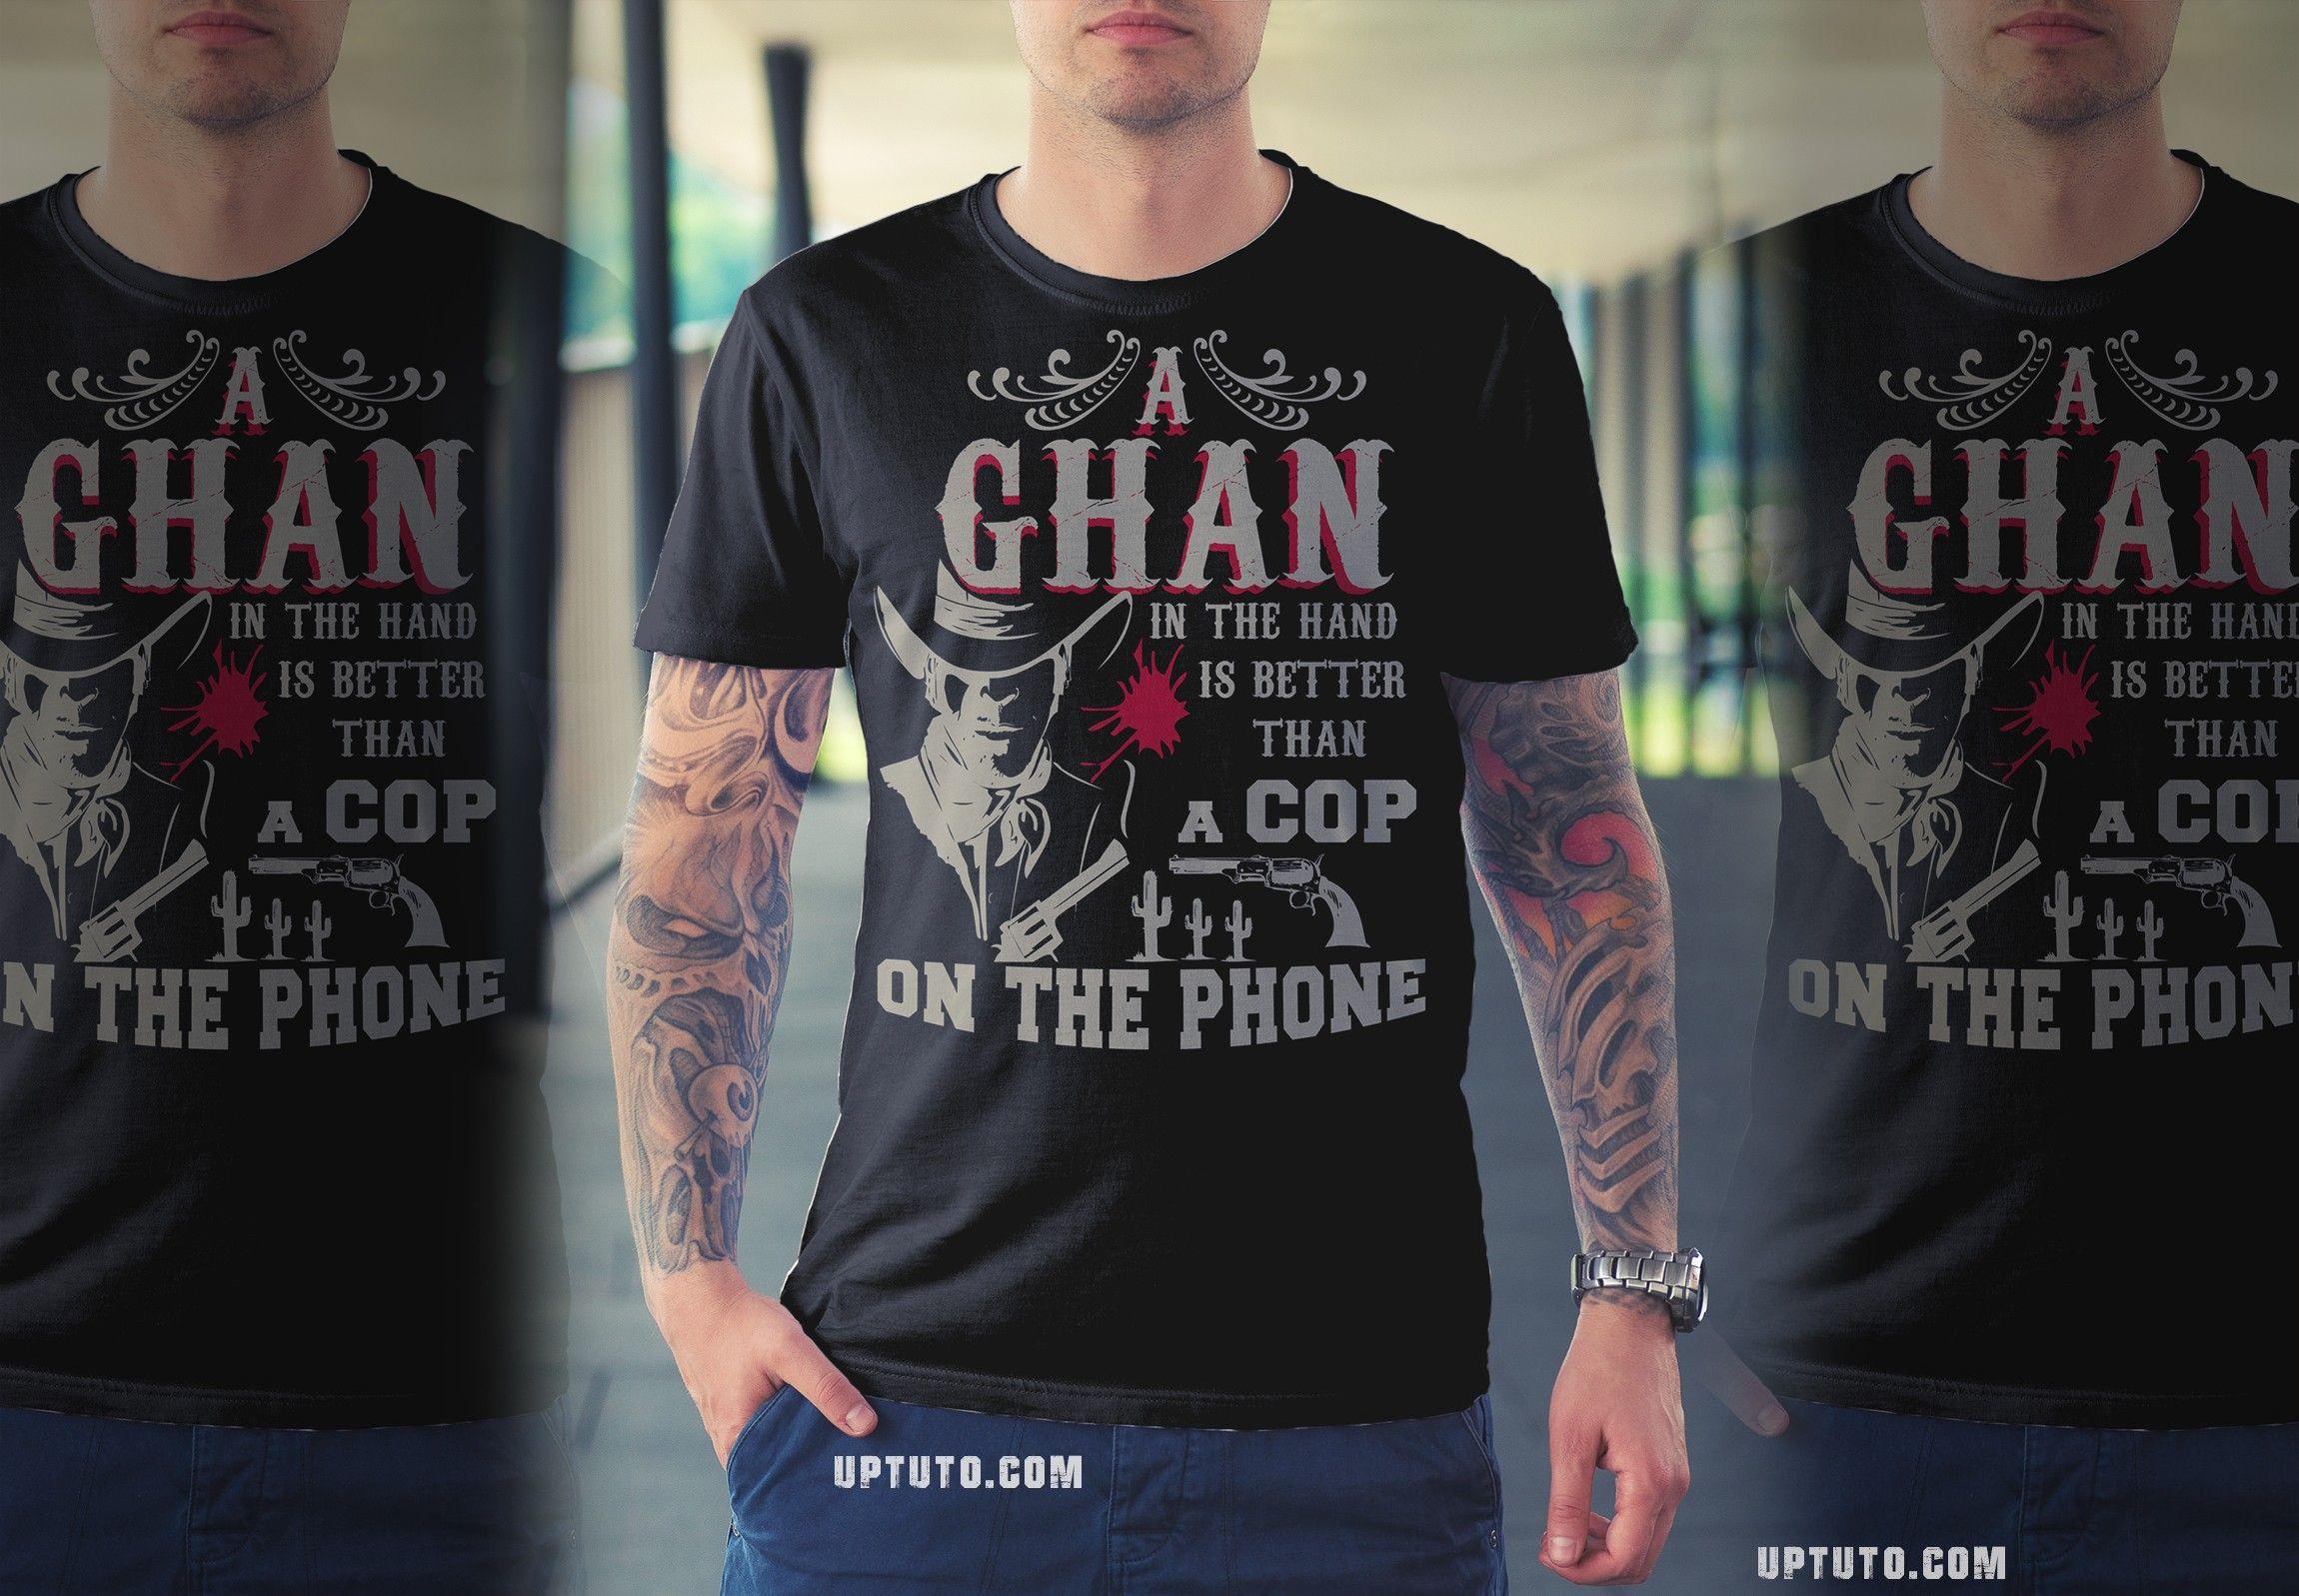 Shirt design near me - T Shirt Printing T Shirt Design T Shirt Template T Shirt Maker